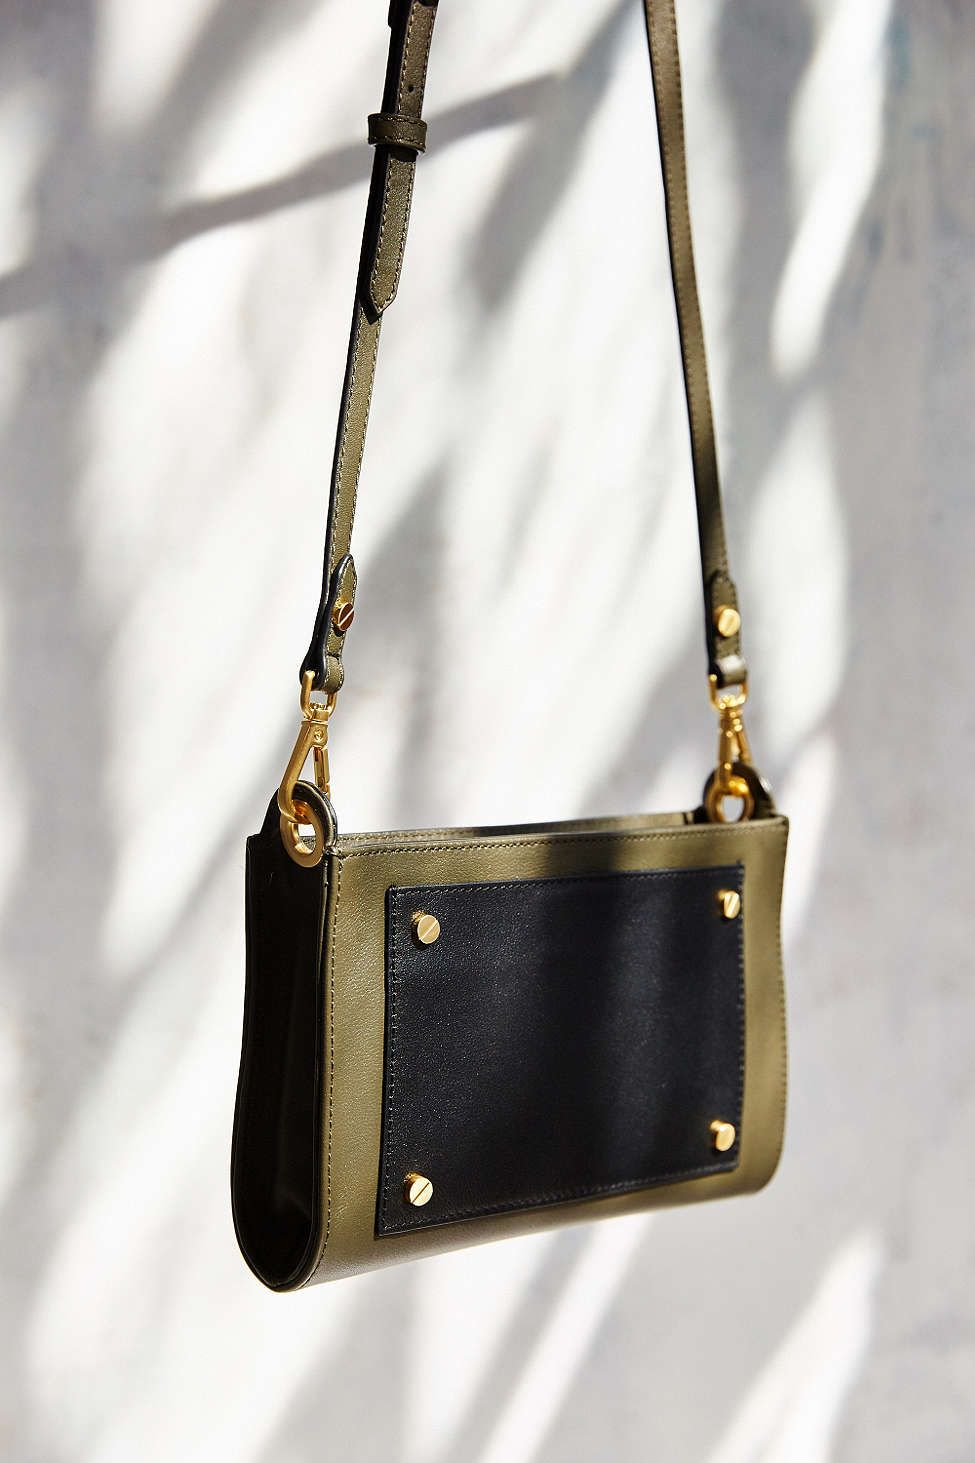 FLYNN Sadie Crossbody Bag - Urban Outfitters